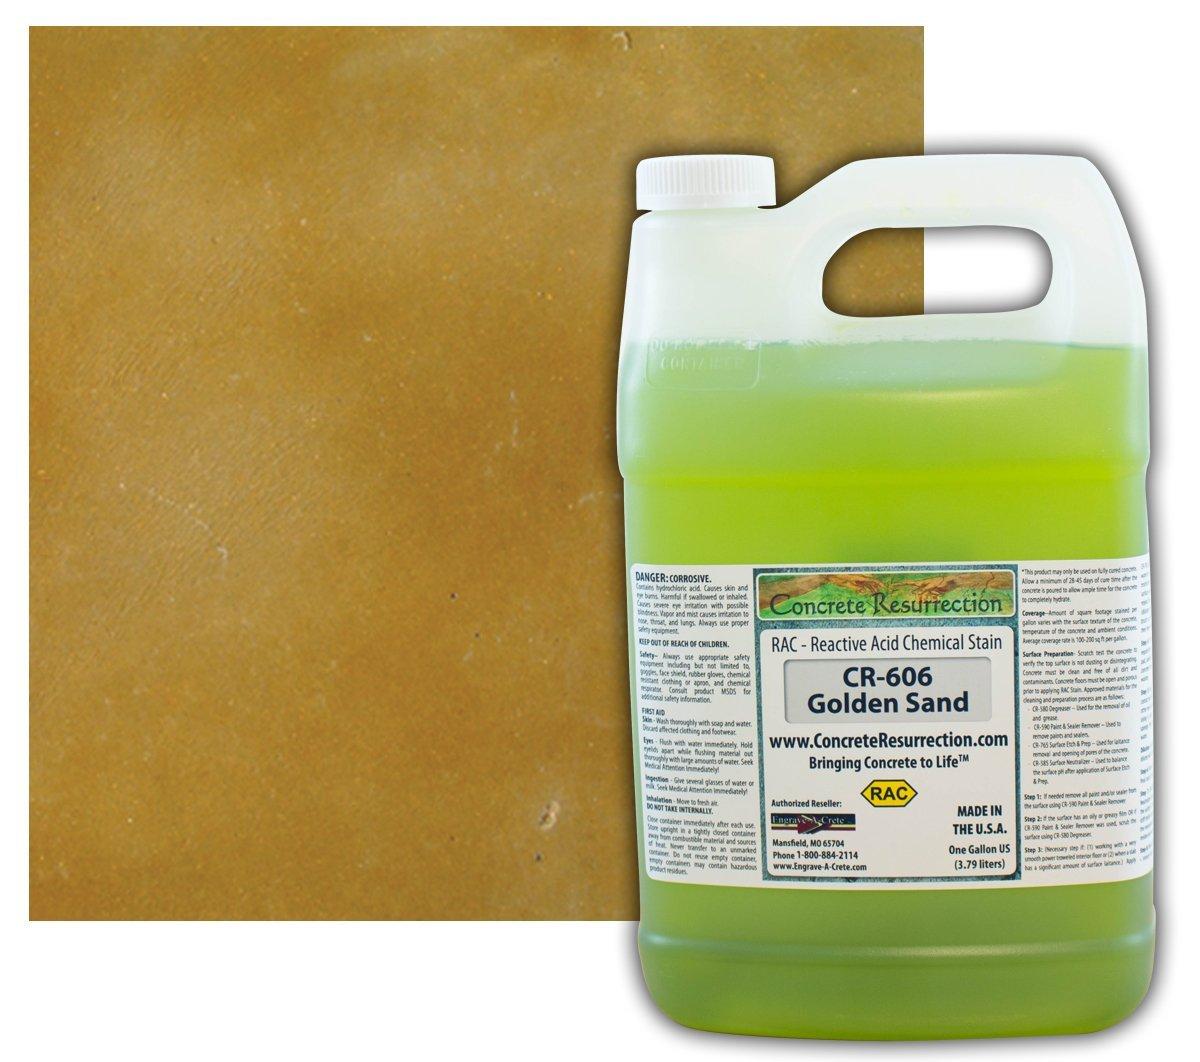 Concrete Stain Professional Easy to Use Acid Stain Golden Sand (Brown w/Golden Undertones)-1 Gallon Concrete Resurrection